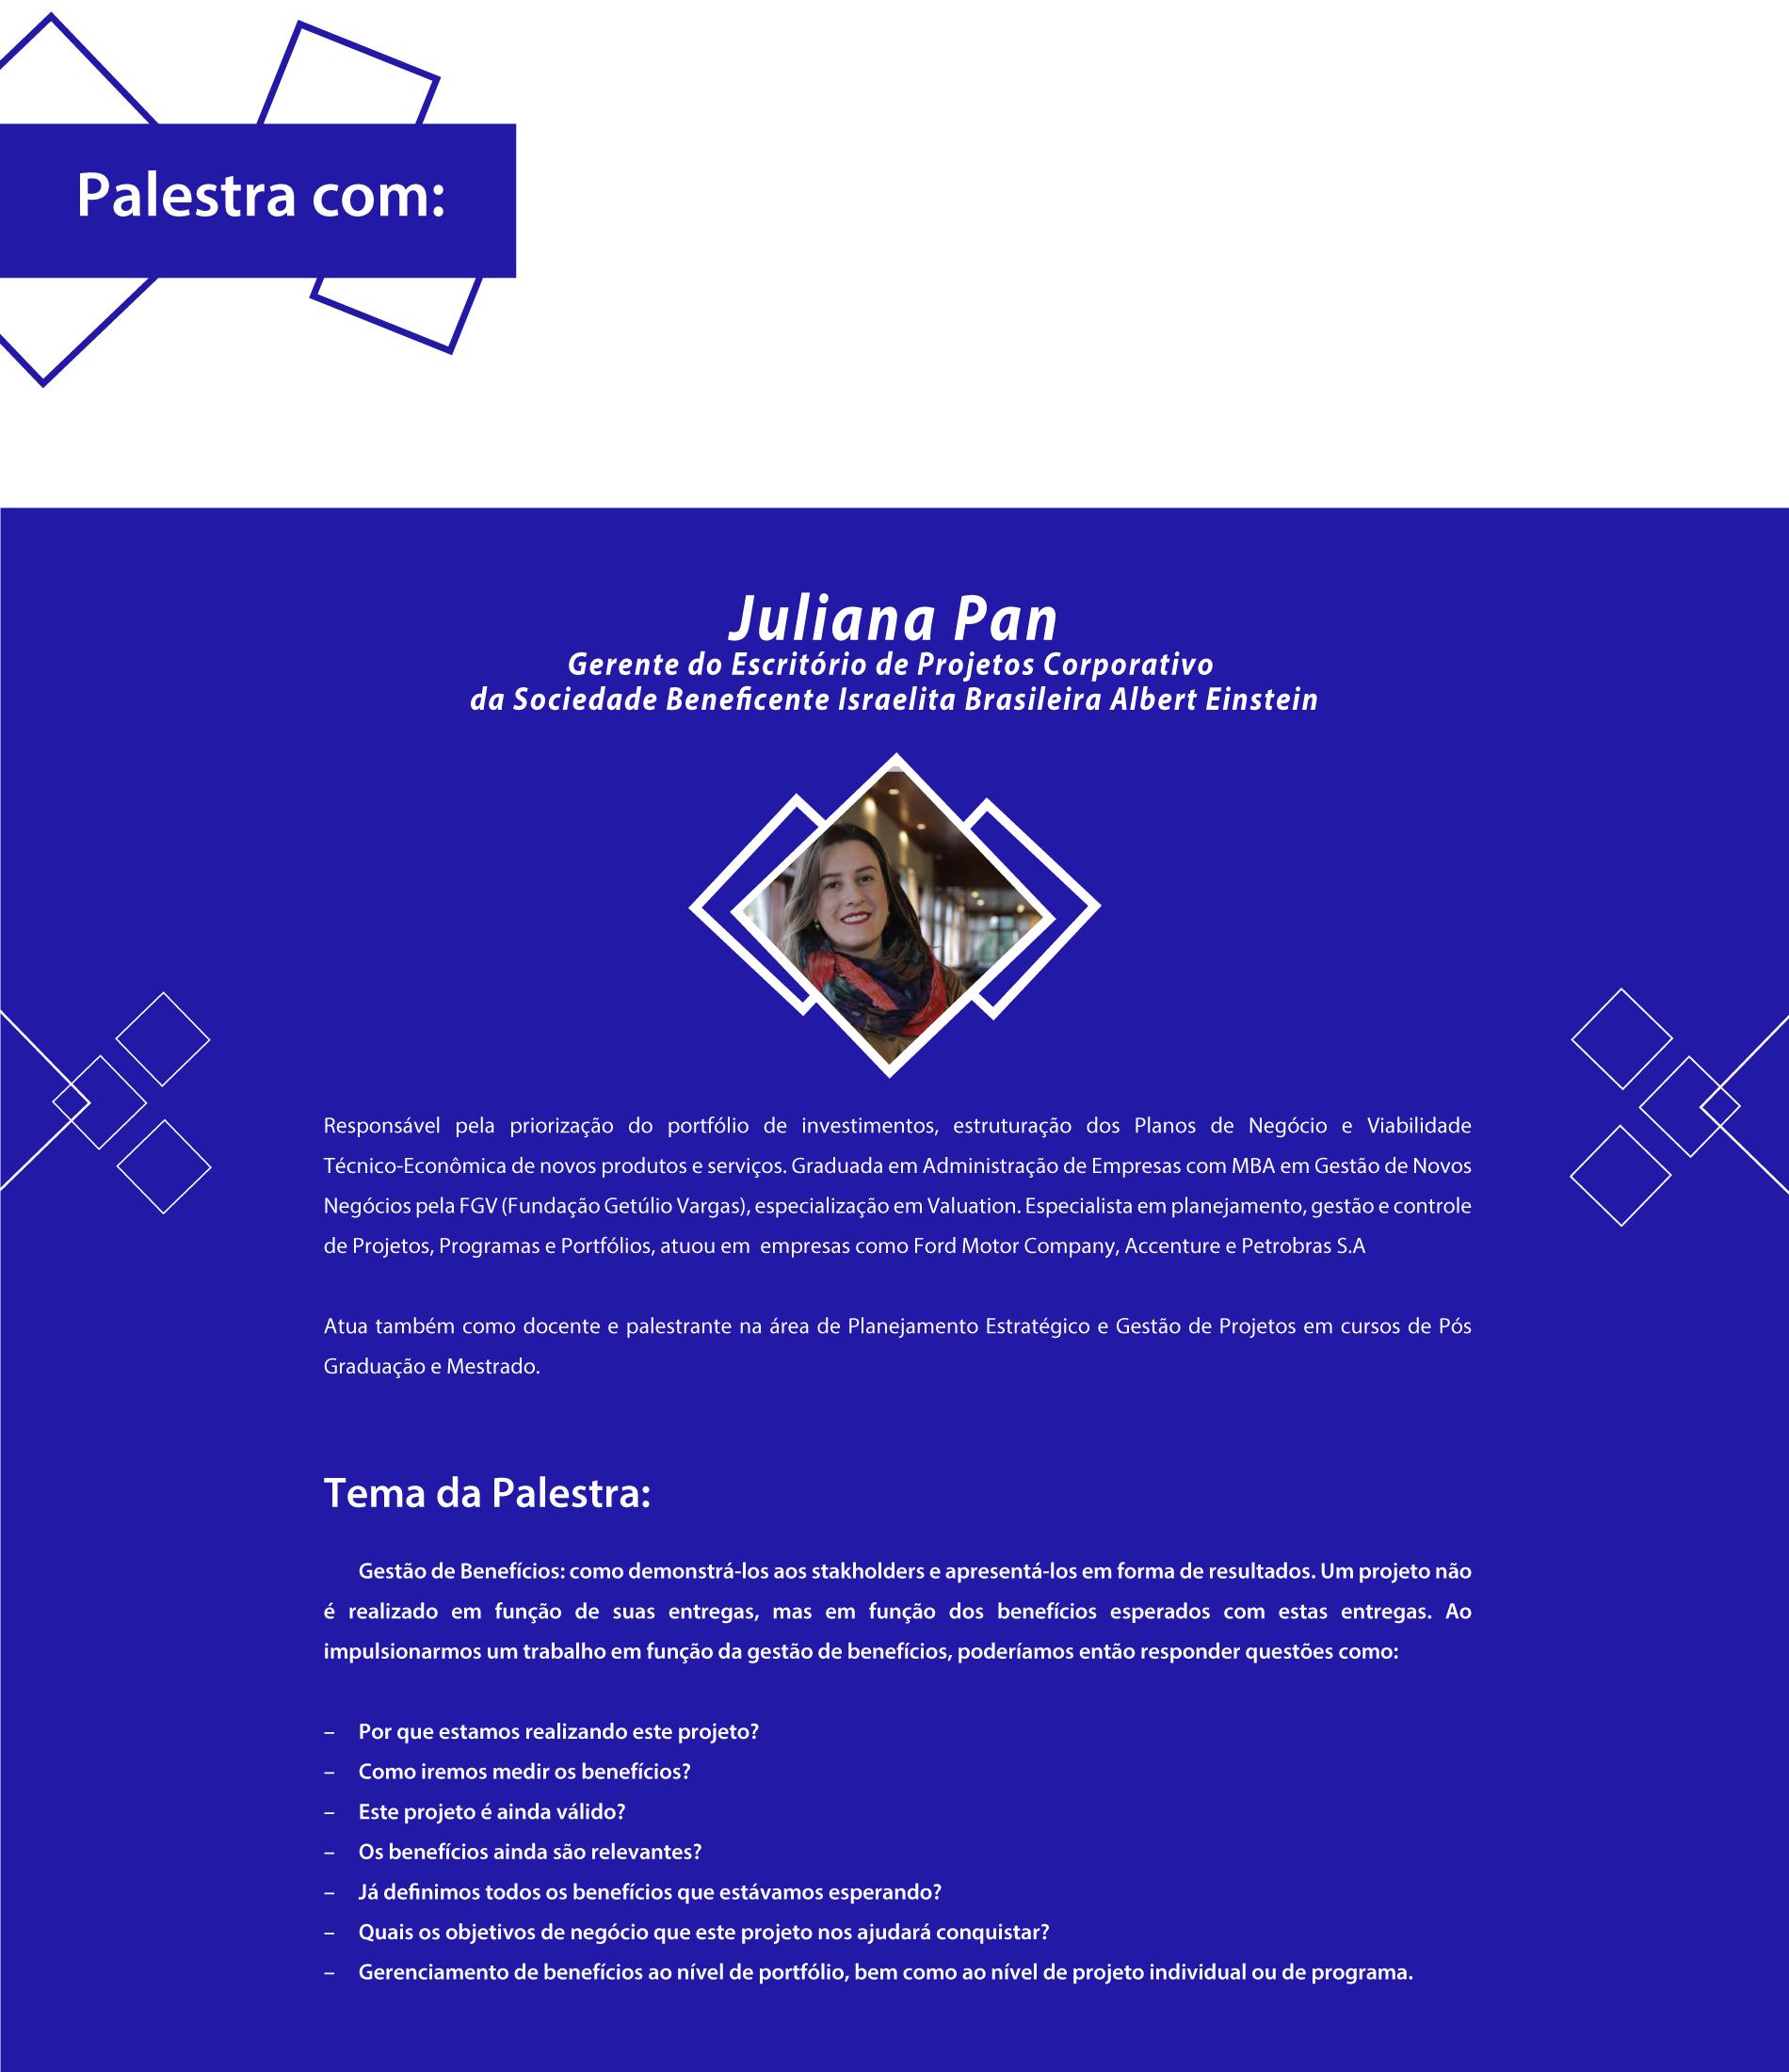 https://www.mestregp.com.br/wp-content/uploads/2018/03/Pagina-PeP-Juliana-1900x2201.png